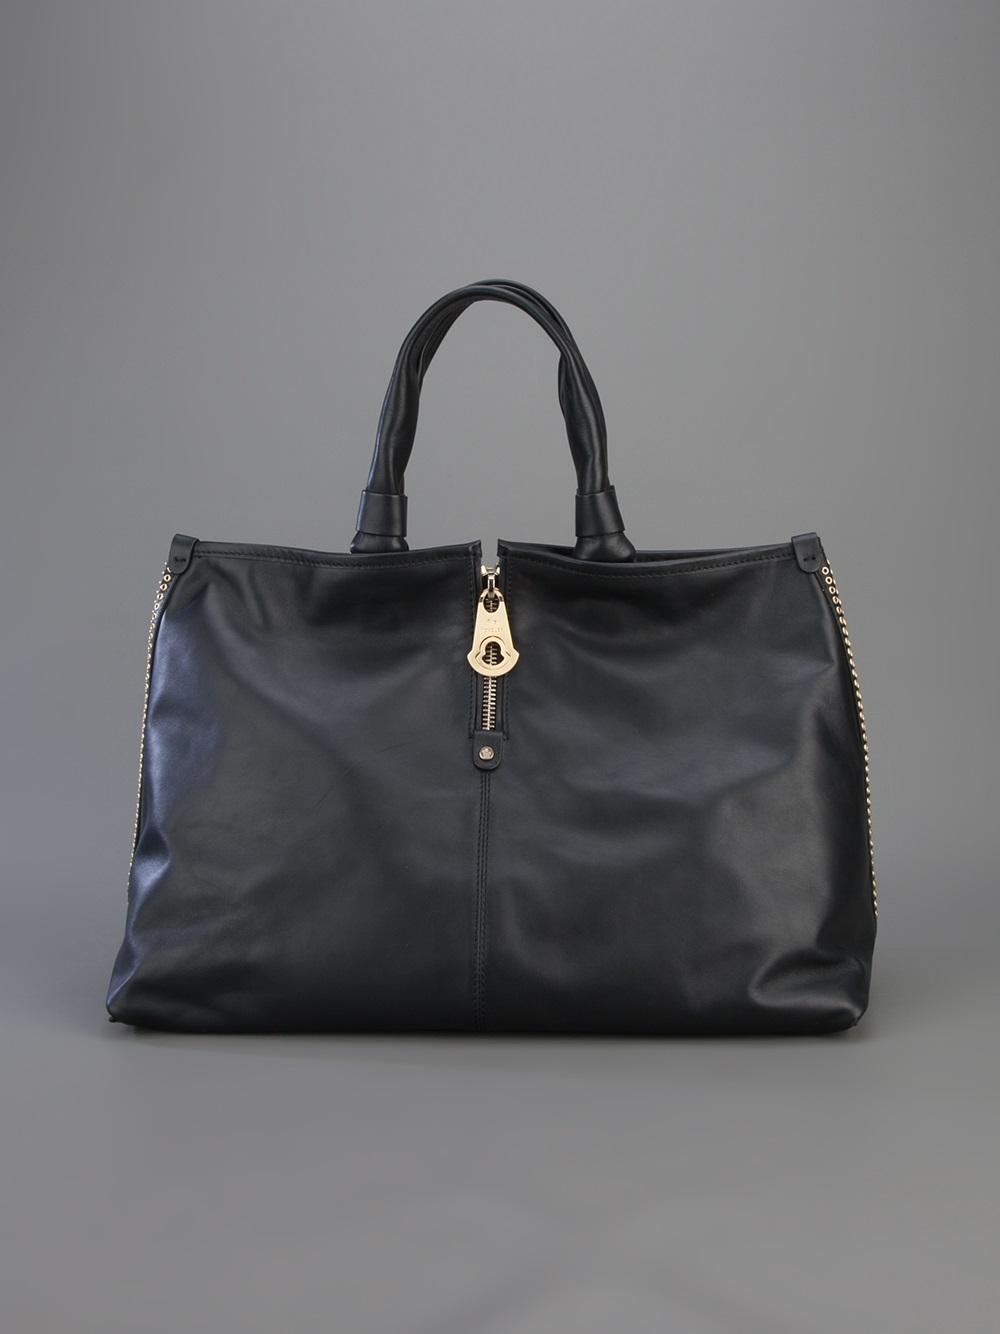 Moncler Amelie Tote in Black